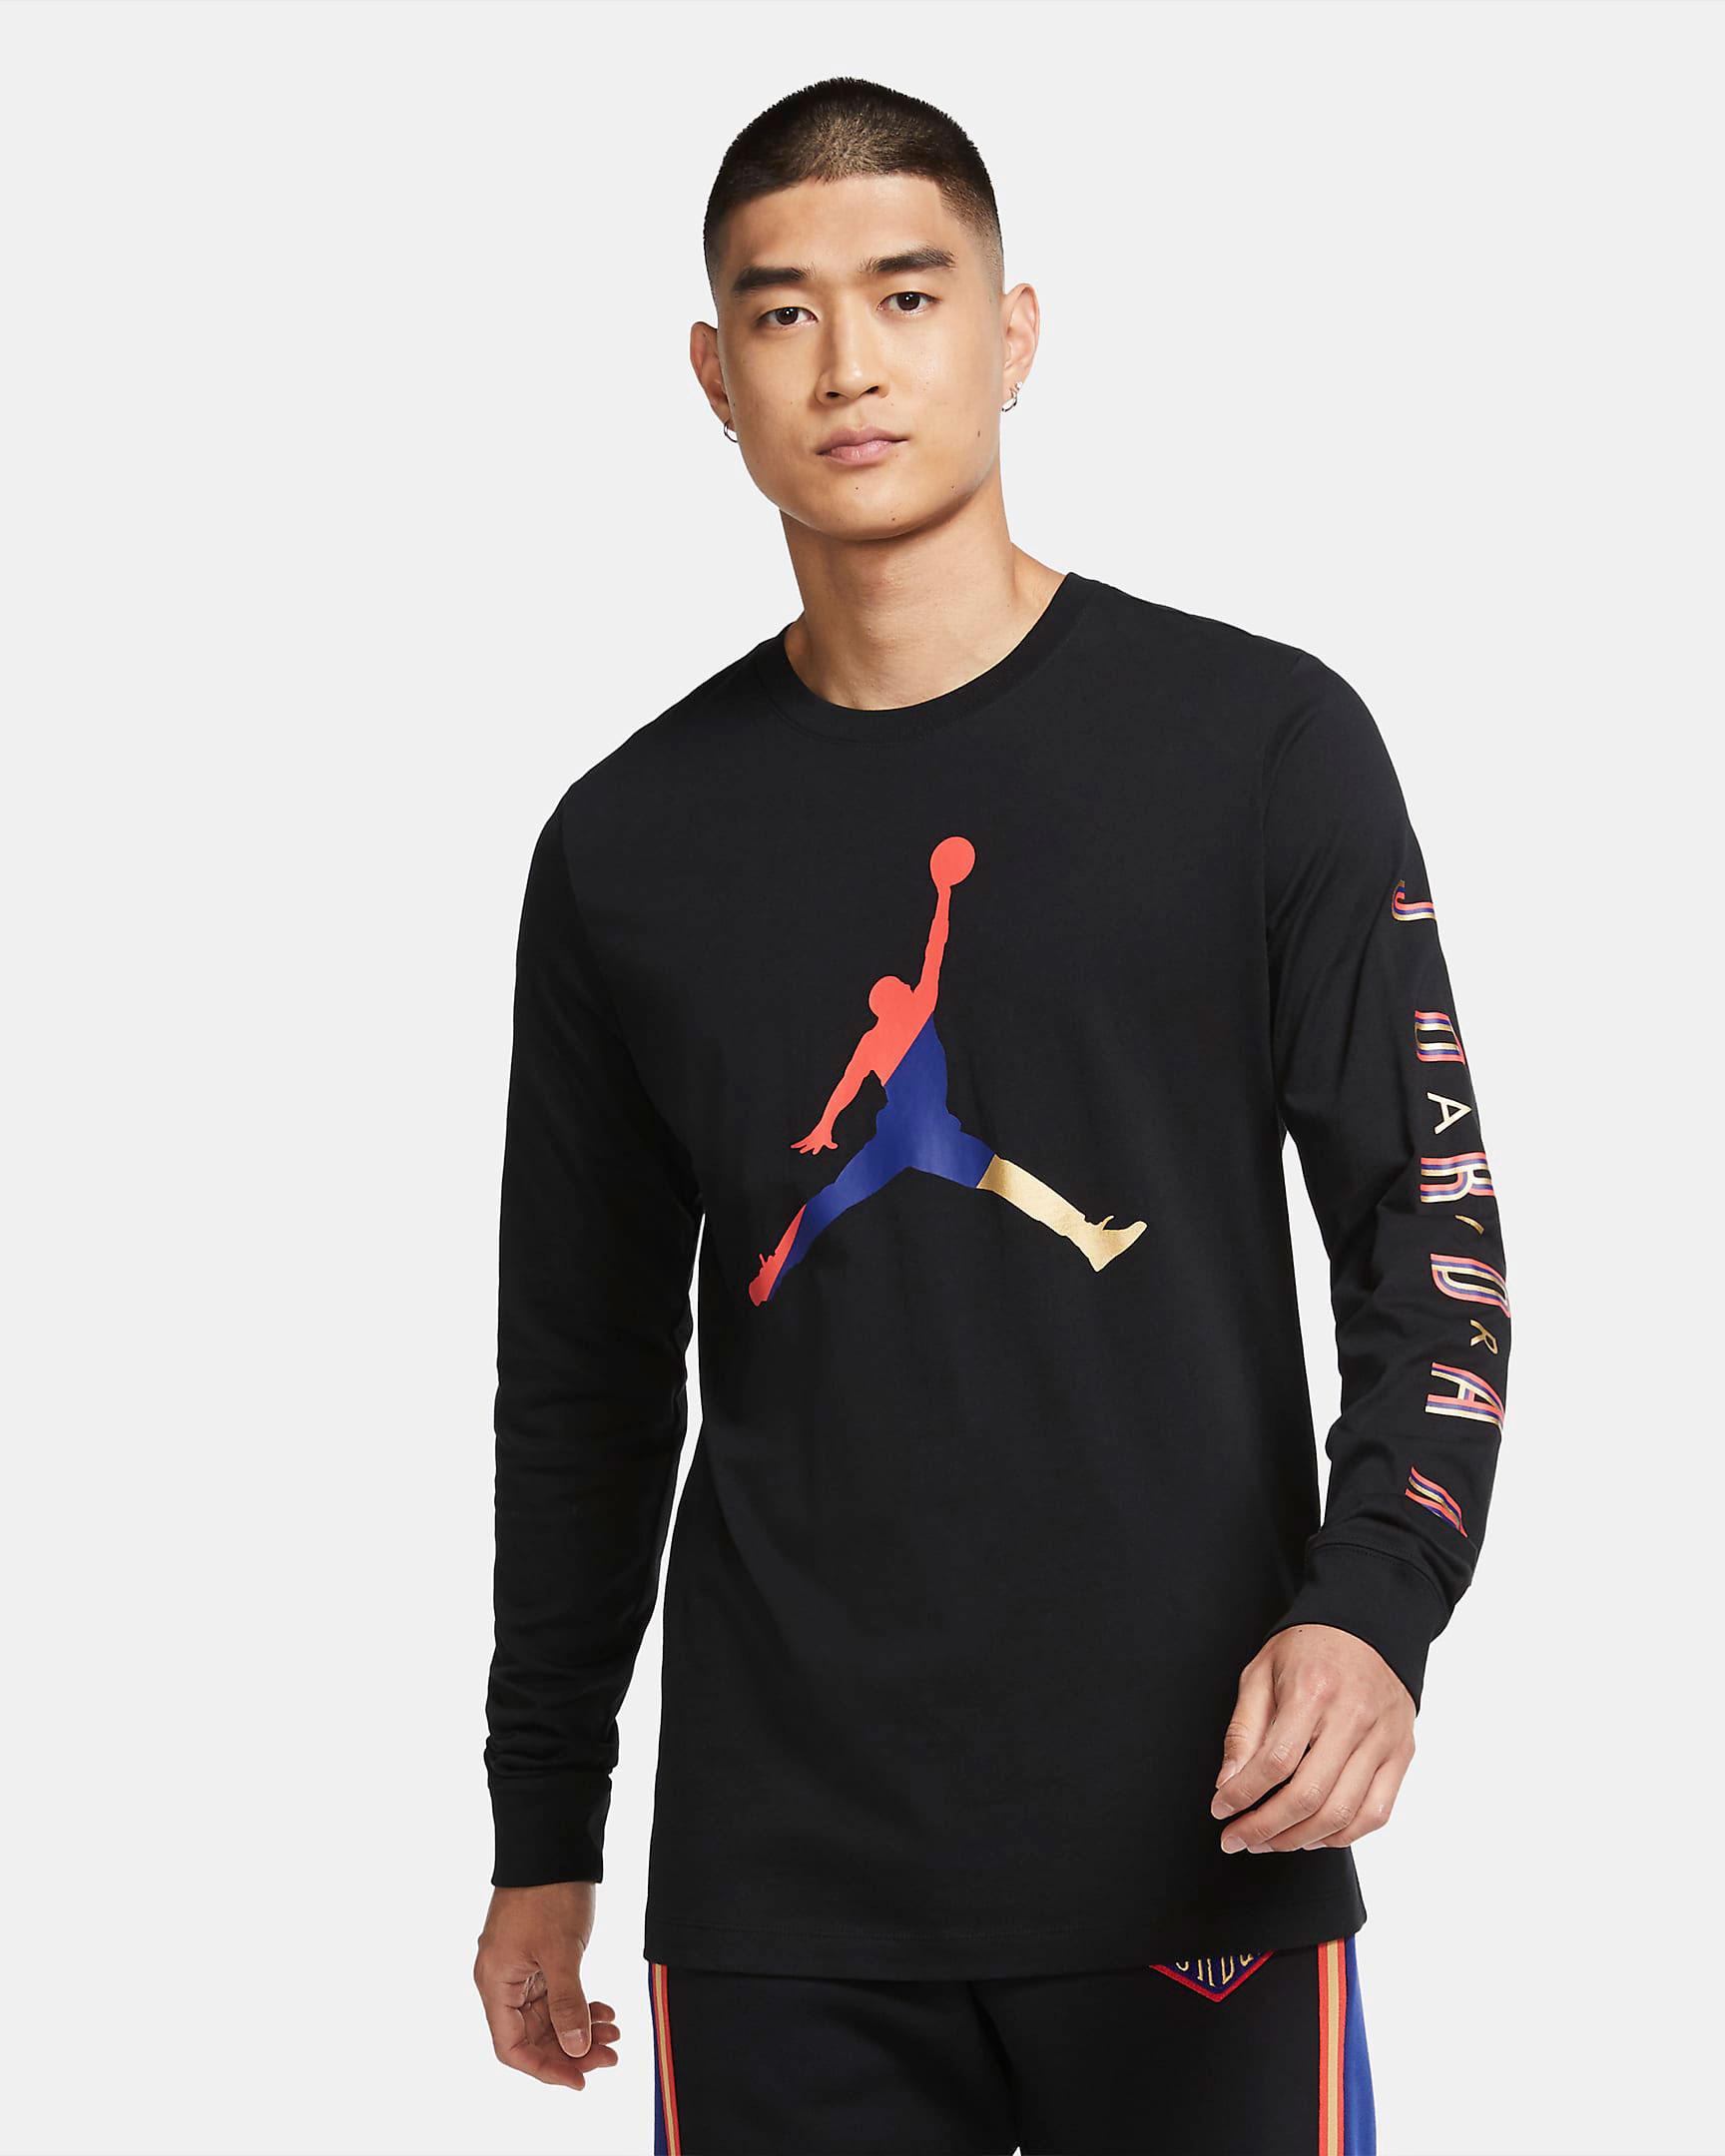 air-jordan-1-low-sweater-nothing-but-net-shirt-1